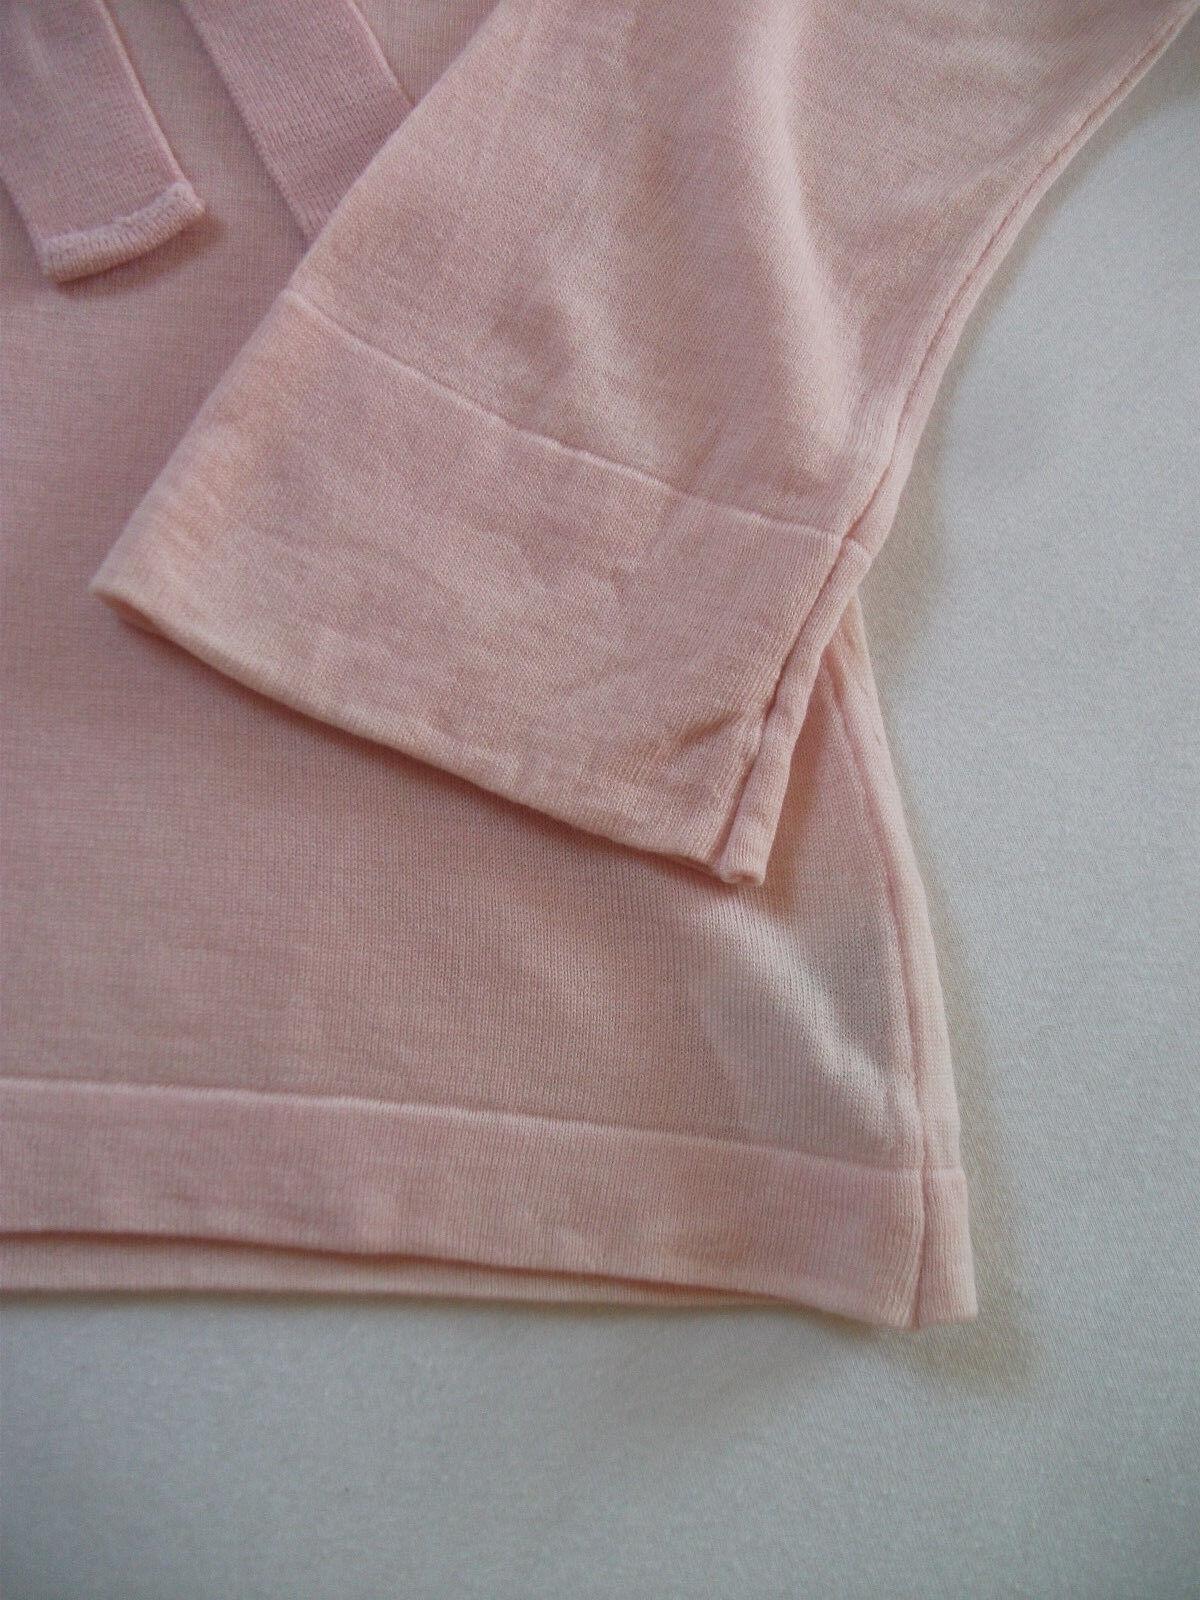 Sweater Refrigiwear M23400 Pullover mit Rundhalsausschnitt Pullover 100% Wolle Pullover Rundhalsausschnitt S 9721c5